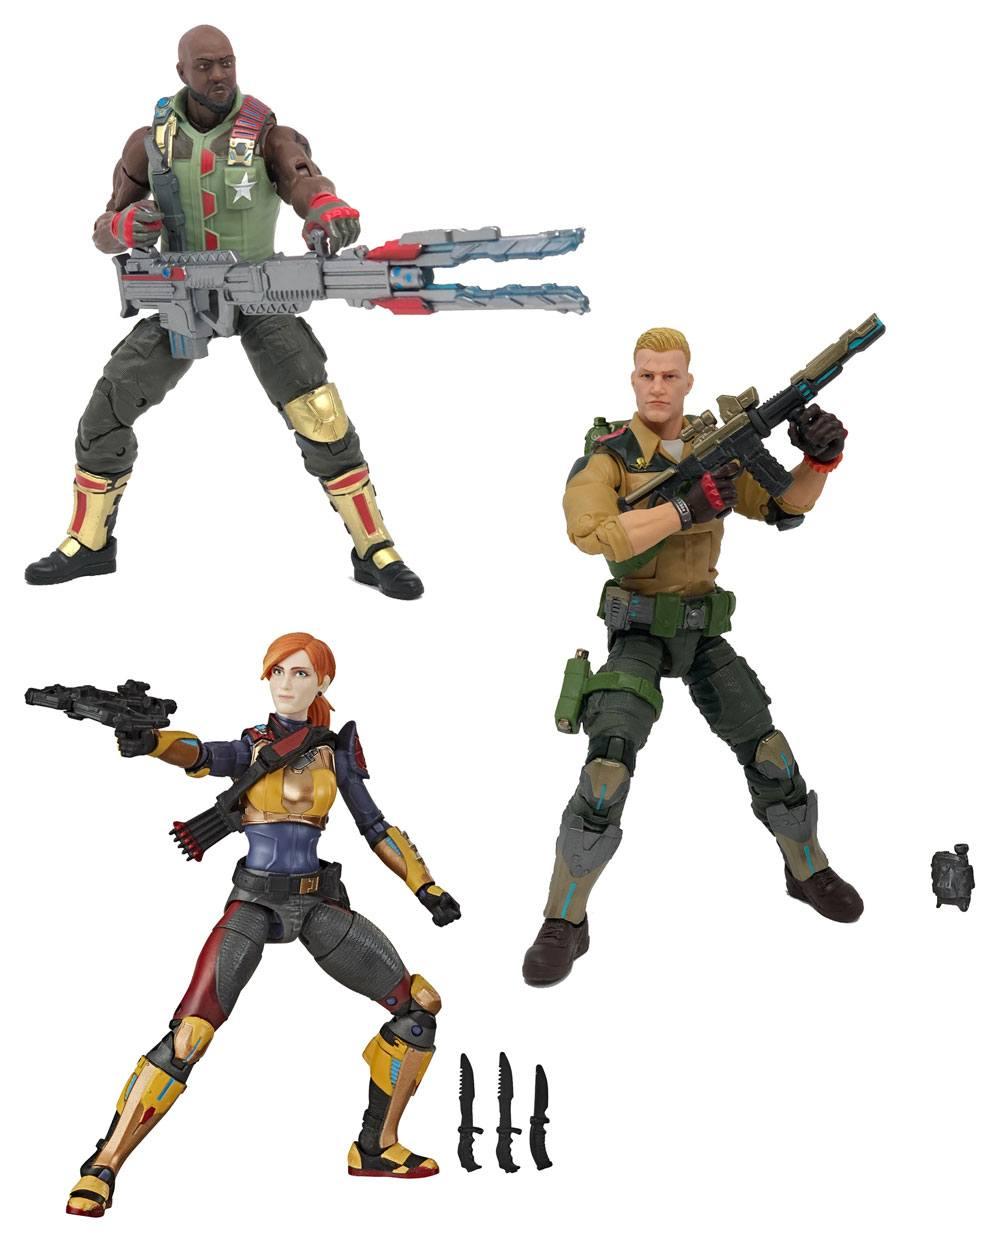 G.I. Joe Classified Series Action Figures 15 cm 2020 Wave 1 Assortment (6)